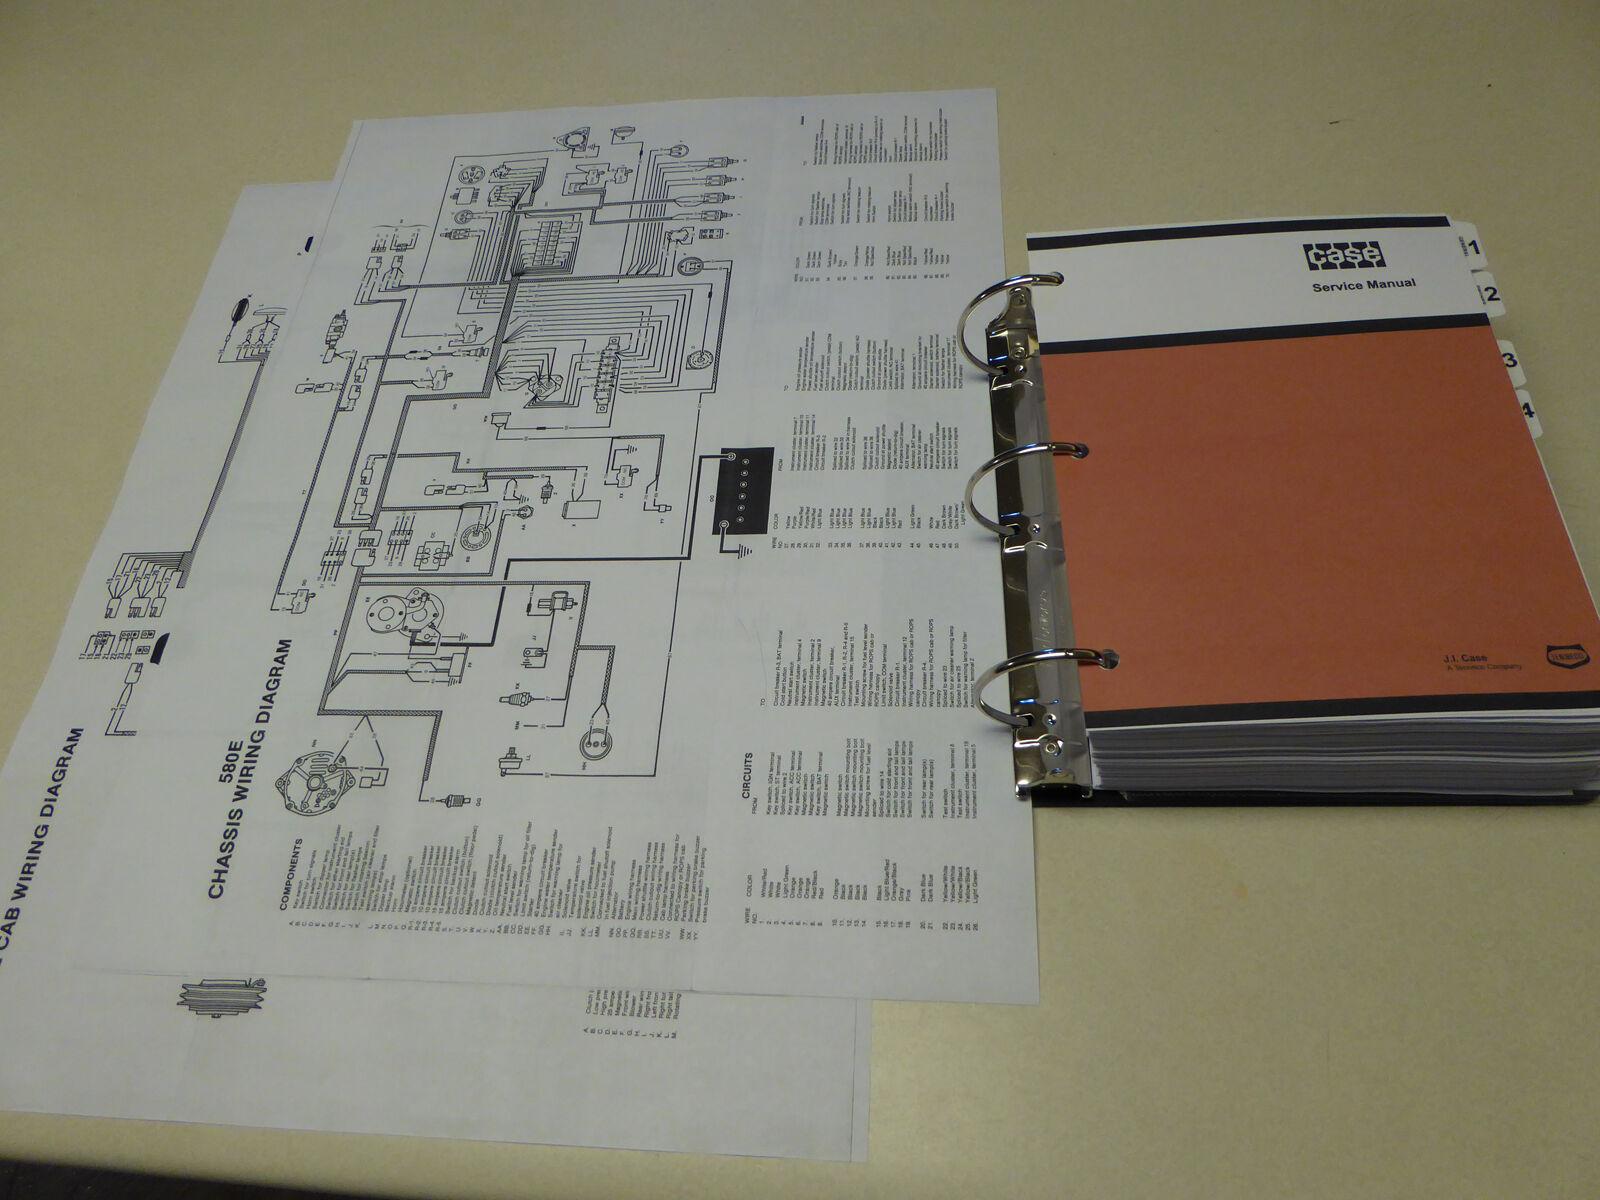 Case 580e 580se 580 Super E Loader Backhoe Service Manual Repair B Wiring Diagram Free Picture Shop New 2 Of 12